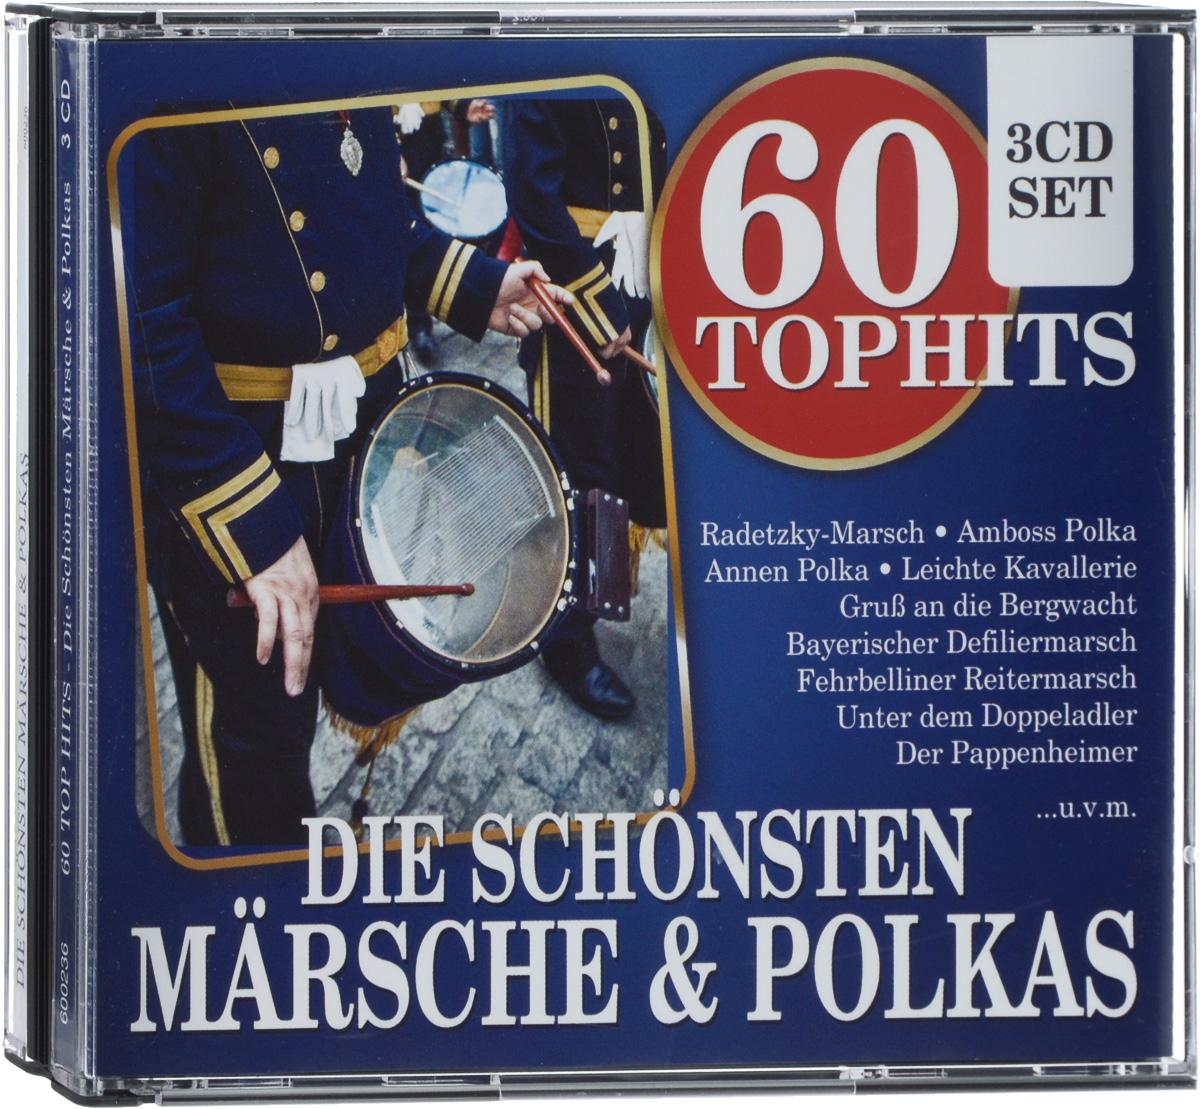 60 Top Hits Marsche & Polkas (3 CD) цена